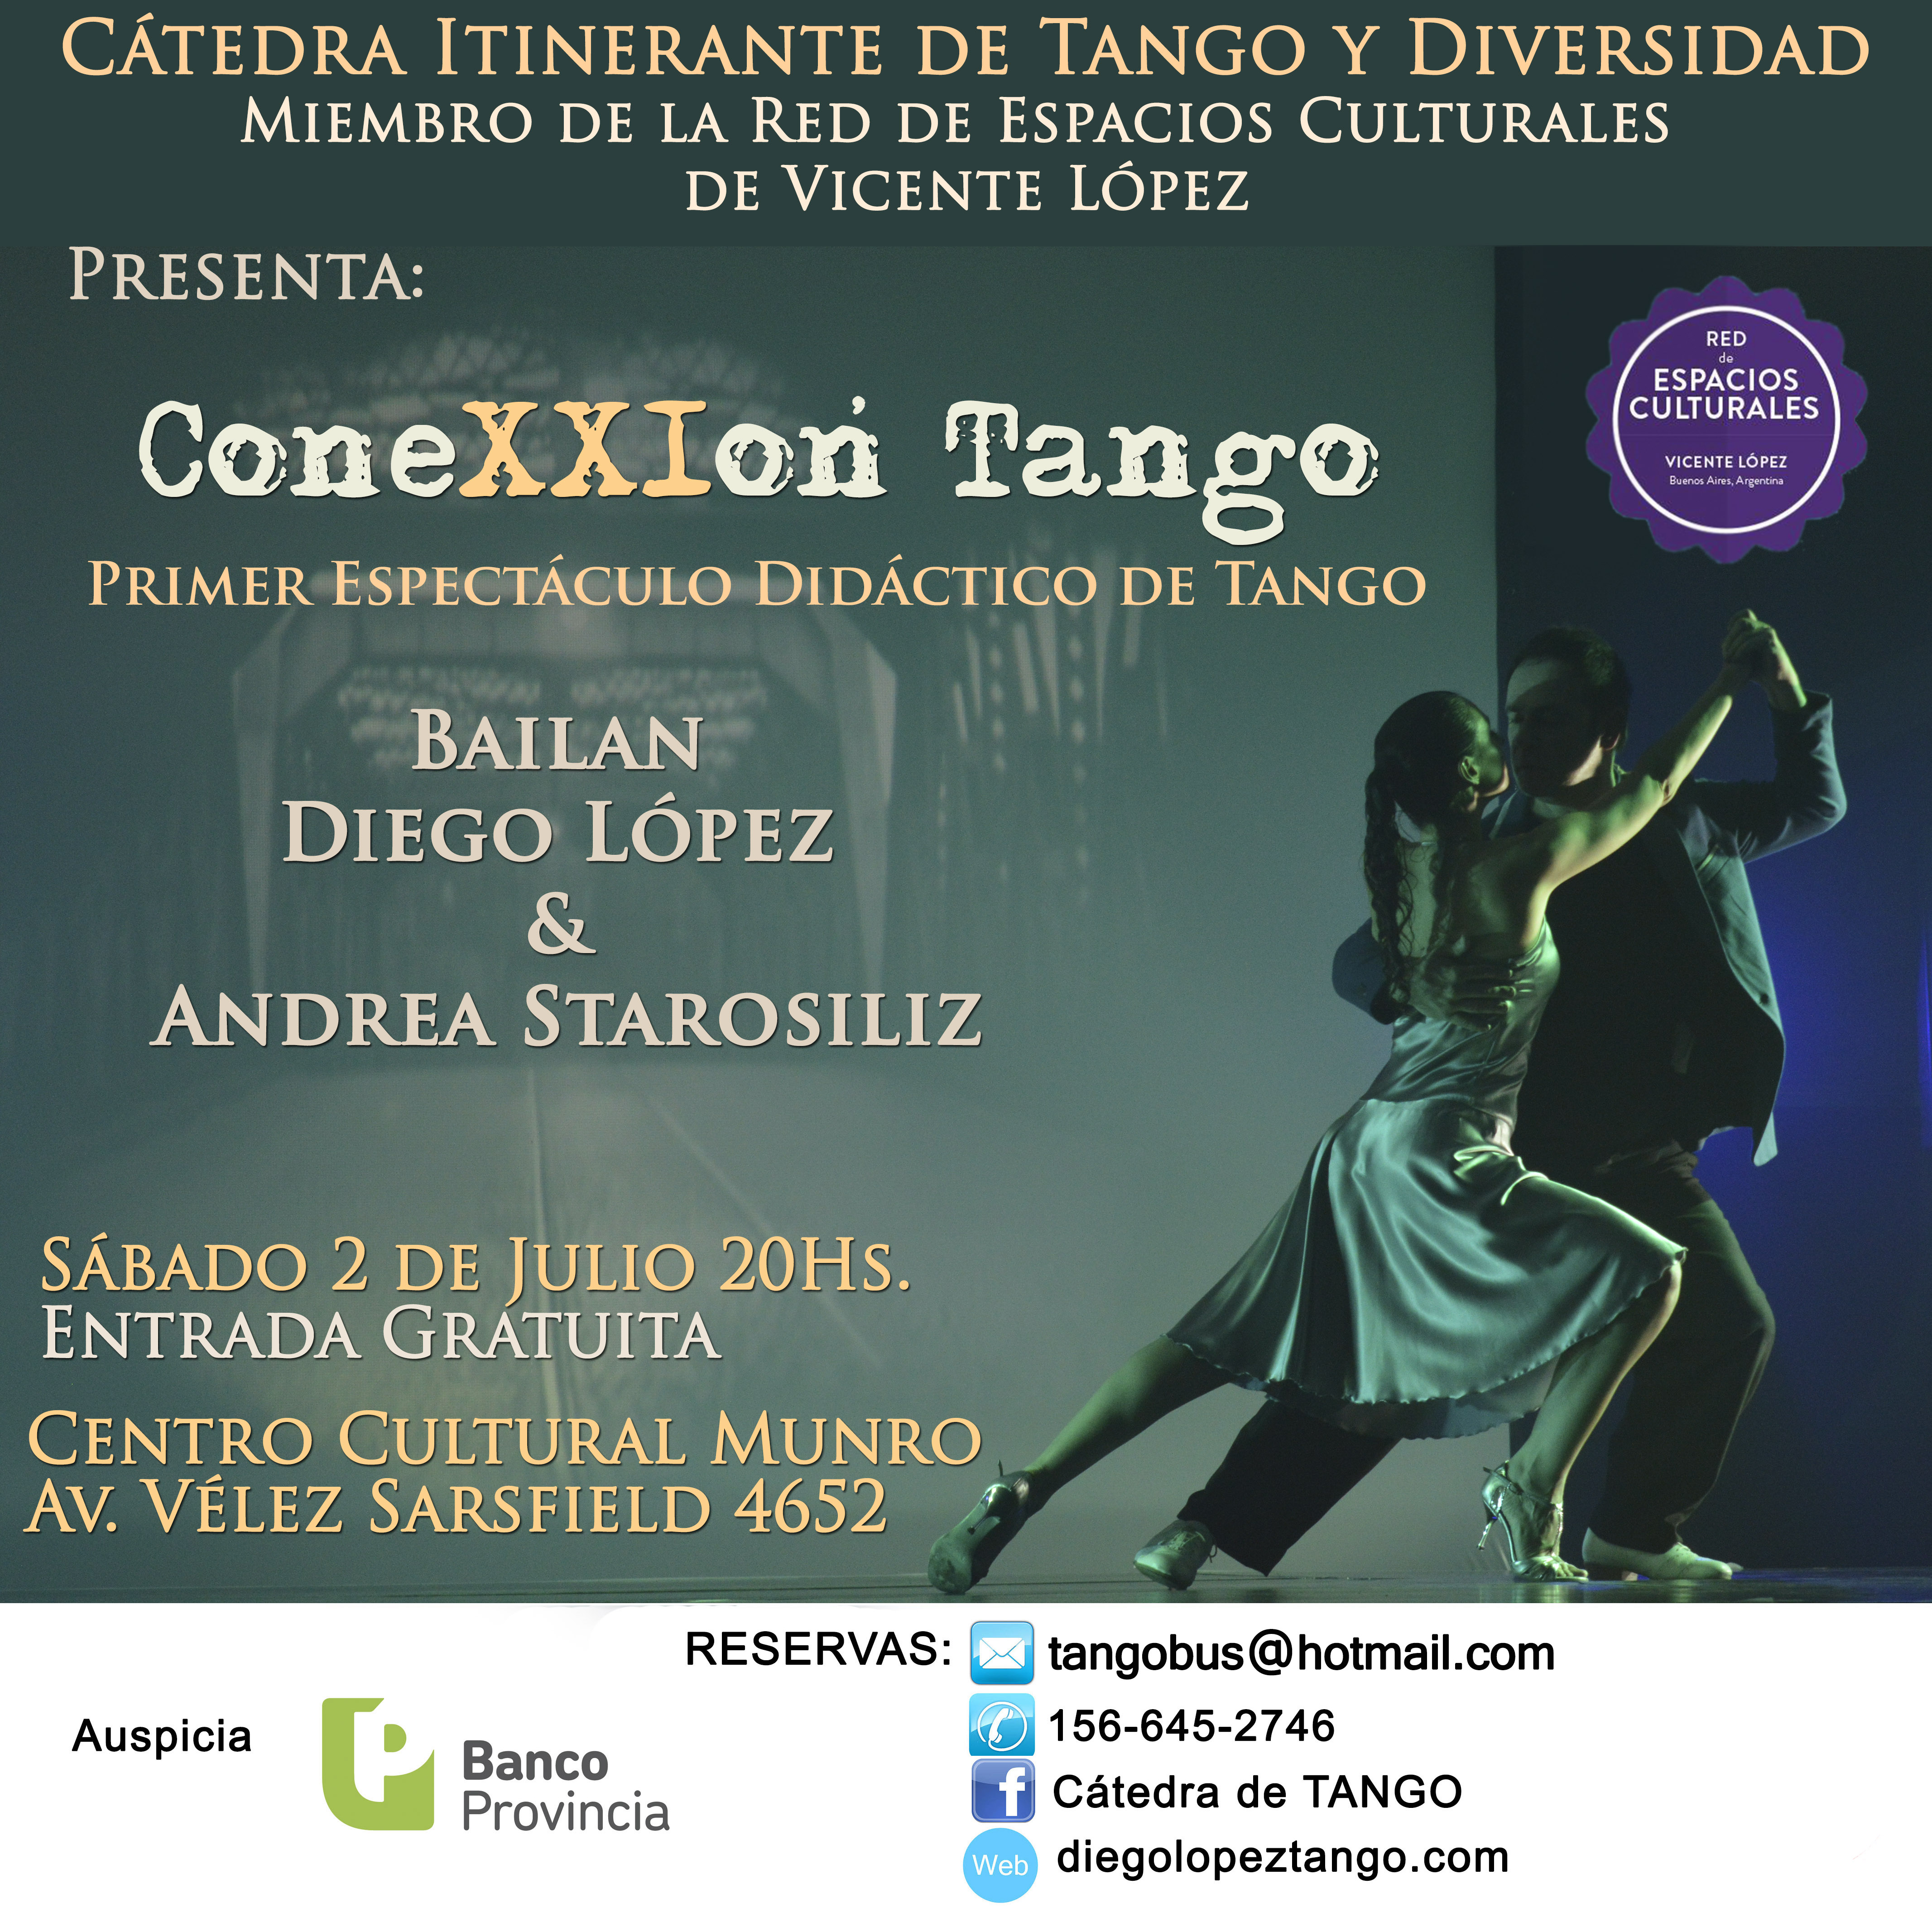 conexxion tango 2-7-2016